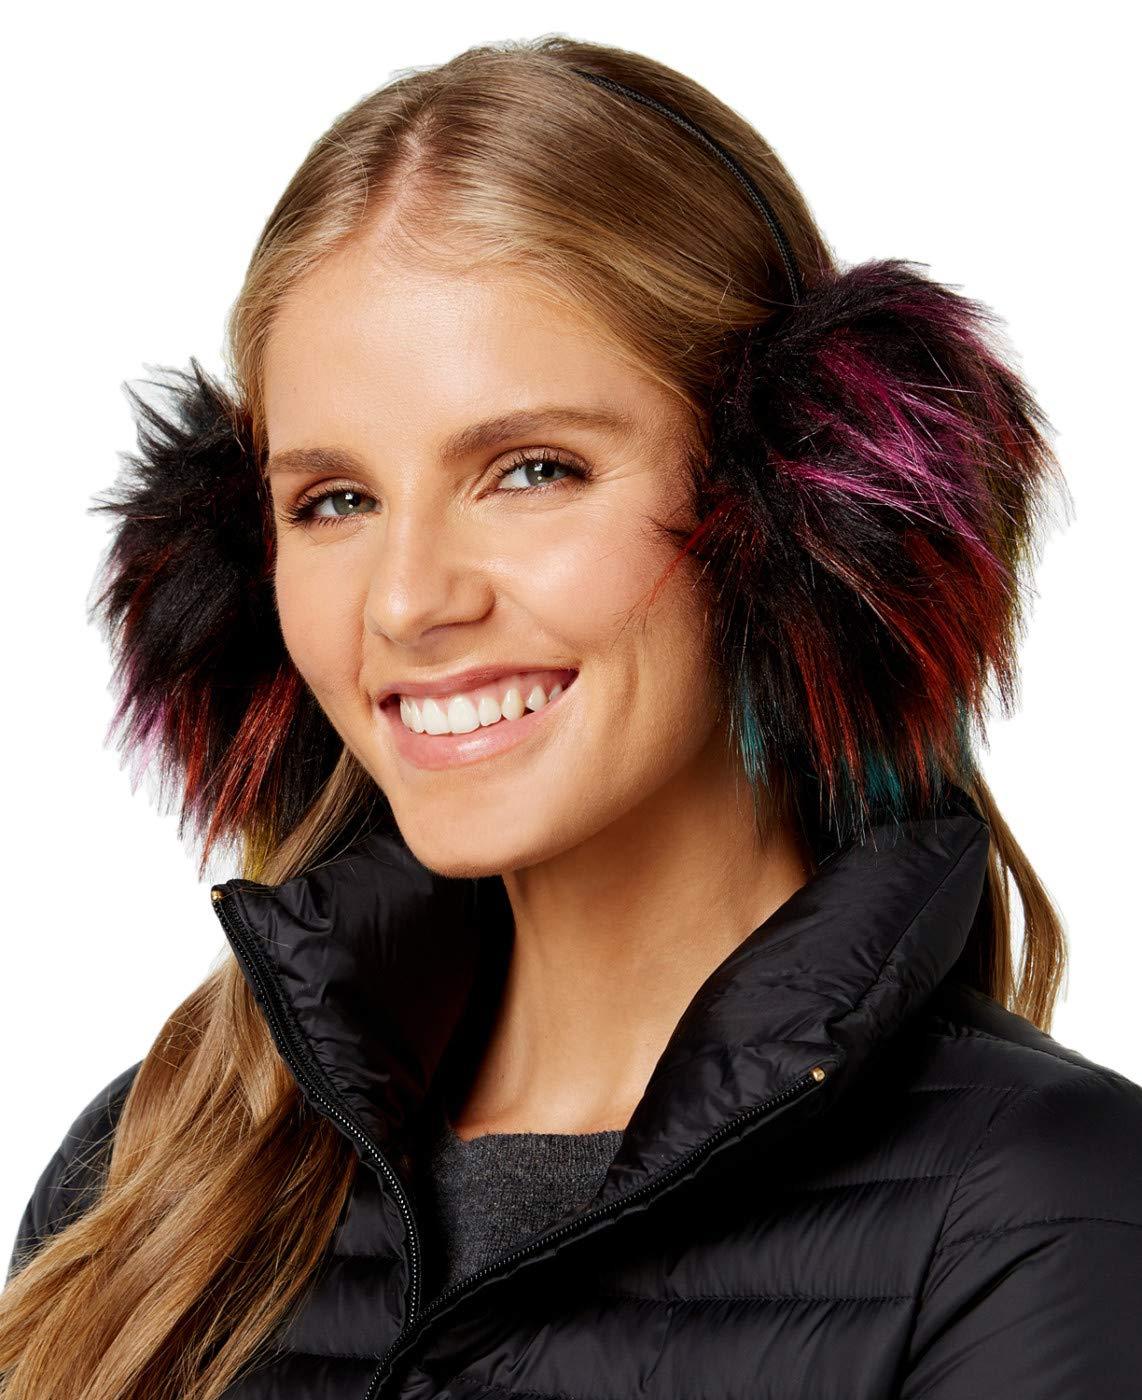 Marcus Adler Womens Faux-Fur Earmuffs One Size Fuschia Multi